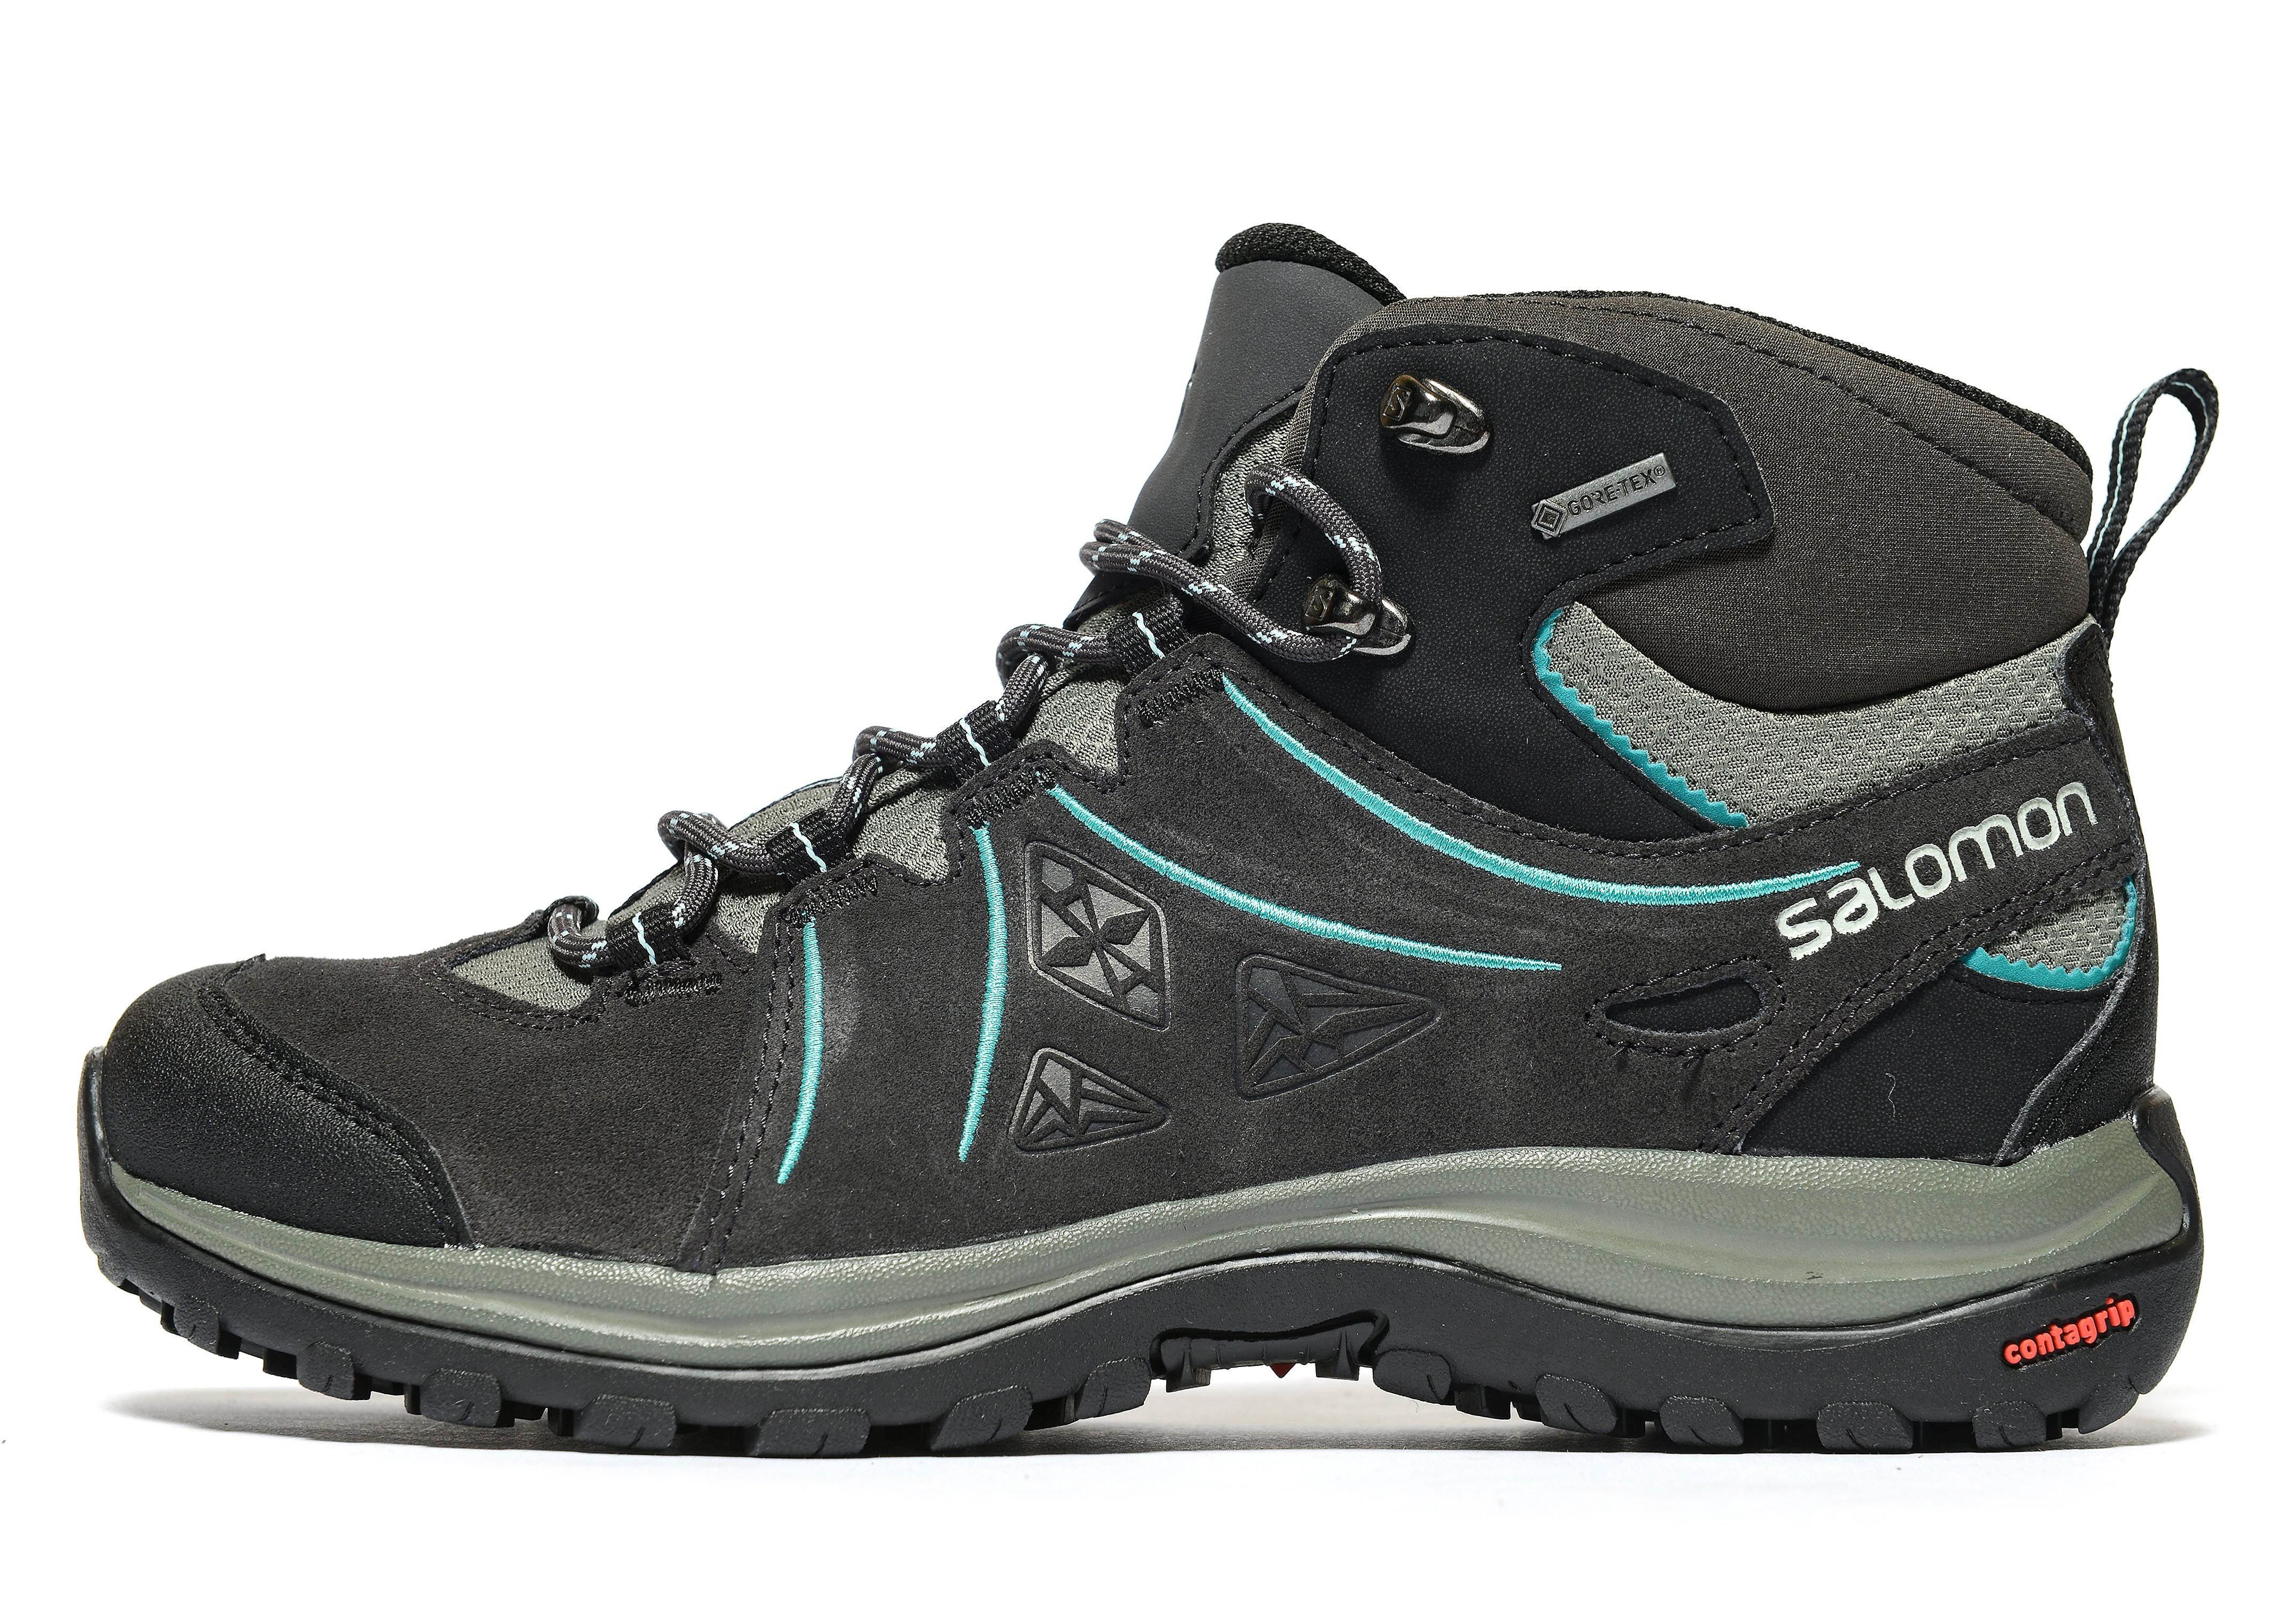 Salomon Ellipse 2 Mid GTX Hiking Boots Women's